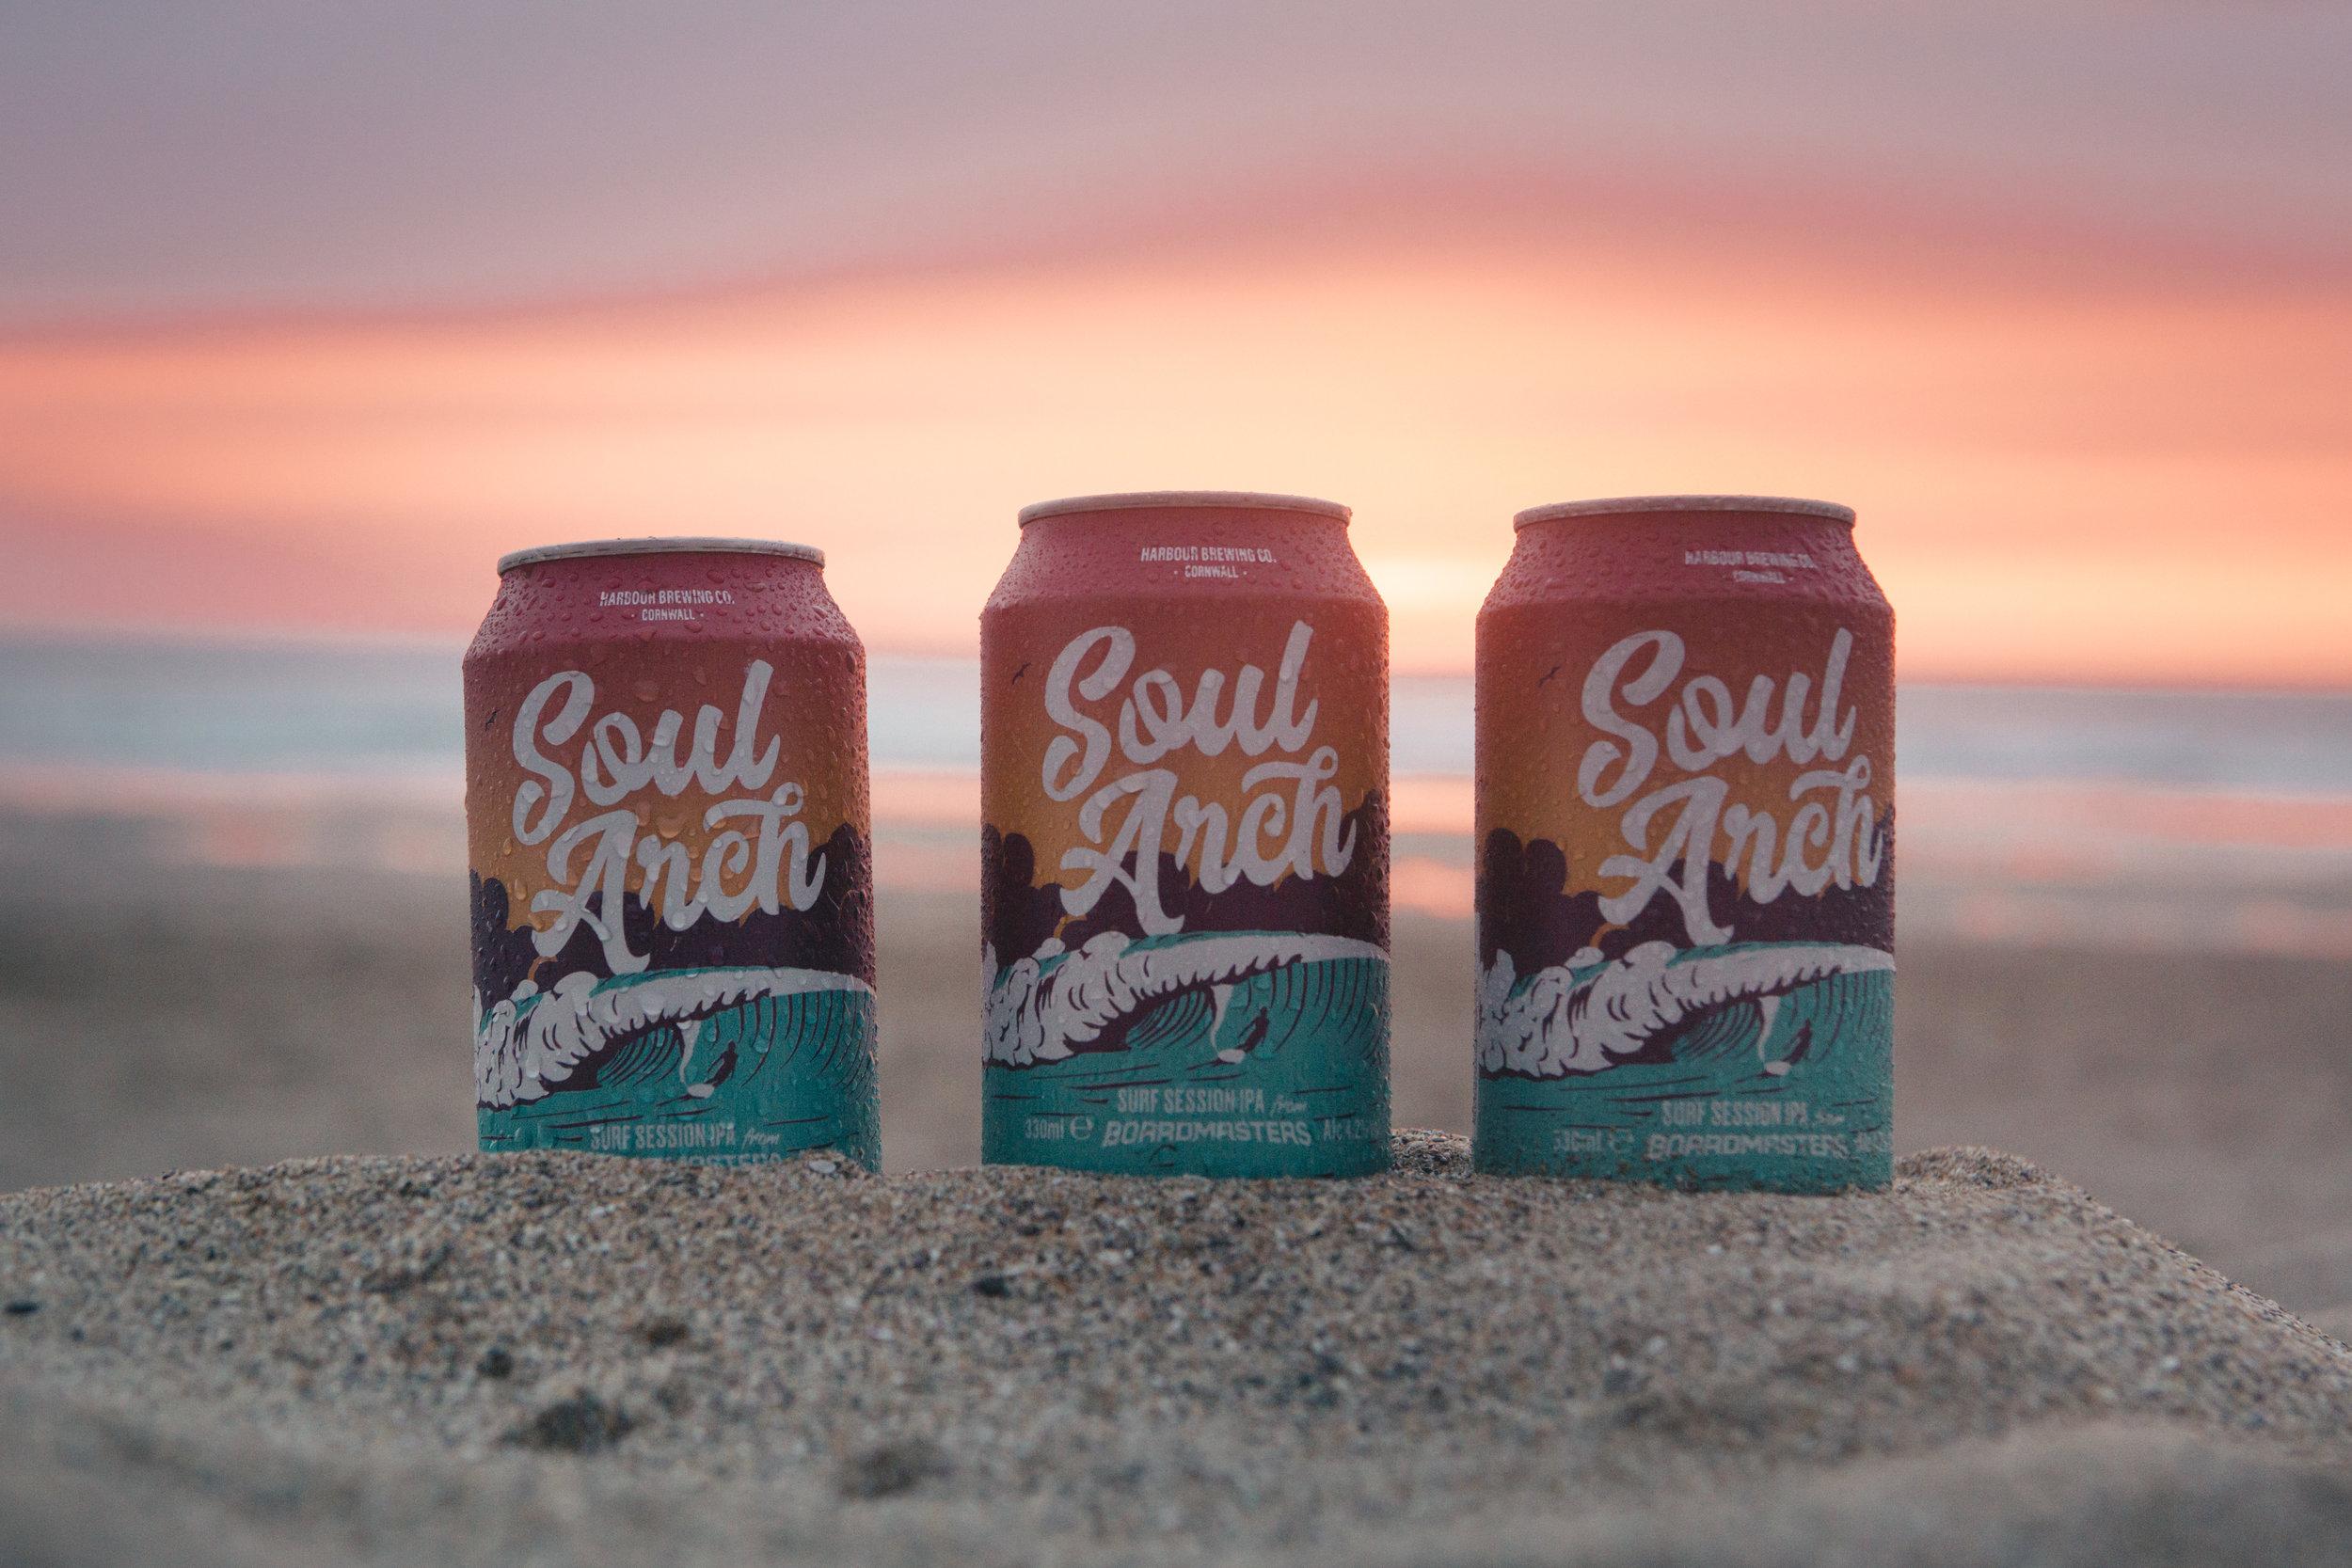 Skype hidden emoticons captain america - Soul Arch Beer Branding